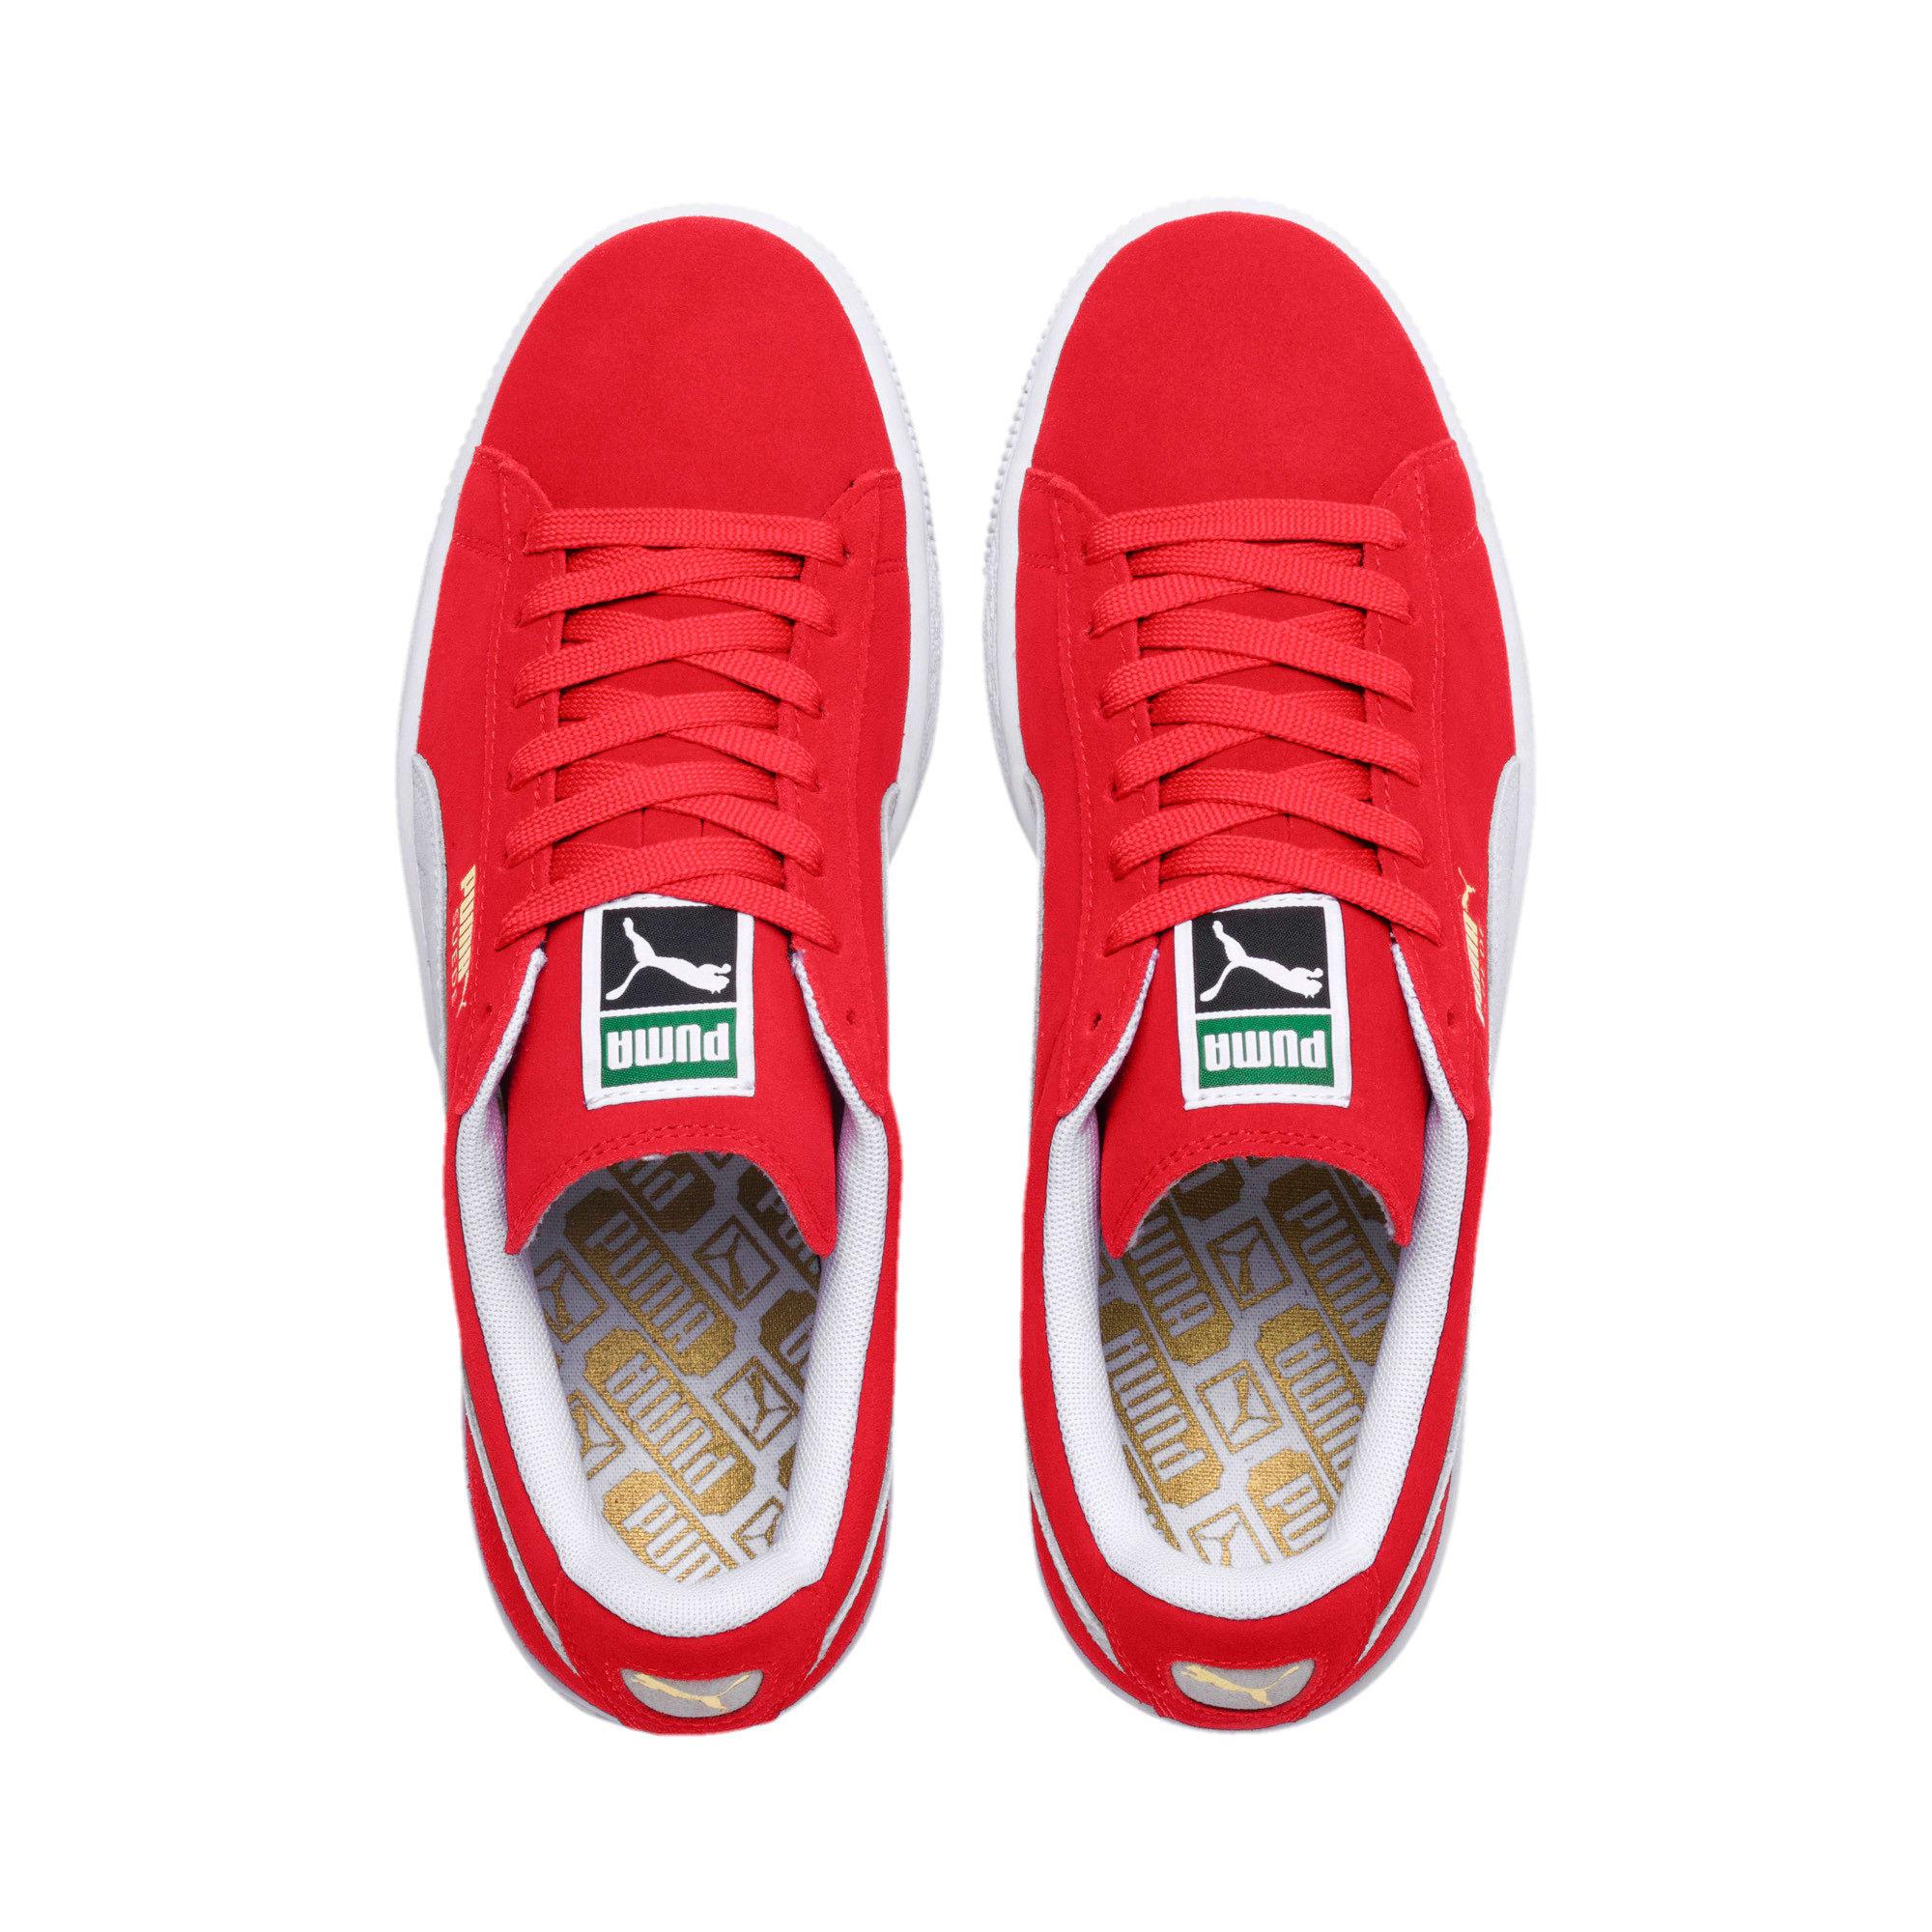 Miniatura 6 de Zapatos deportivos clásicos de gamuza, team regal red-white, mediano